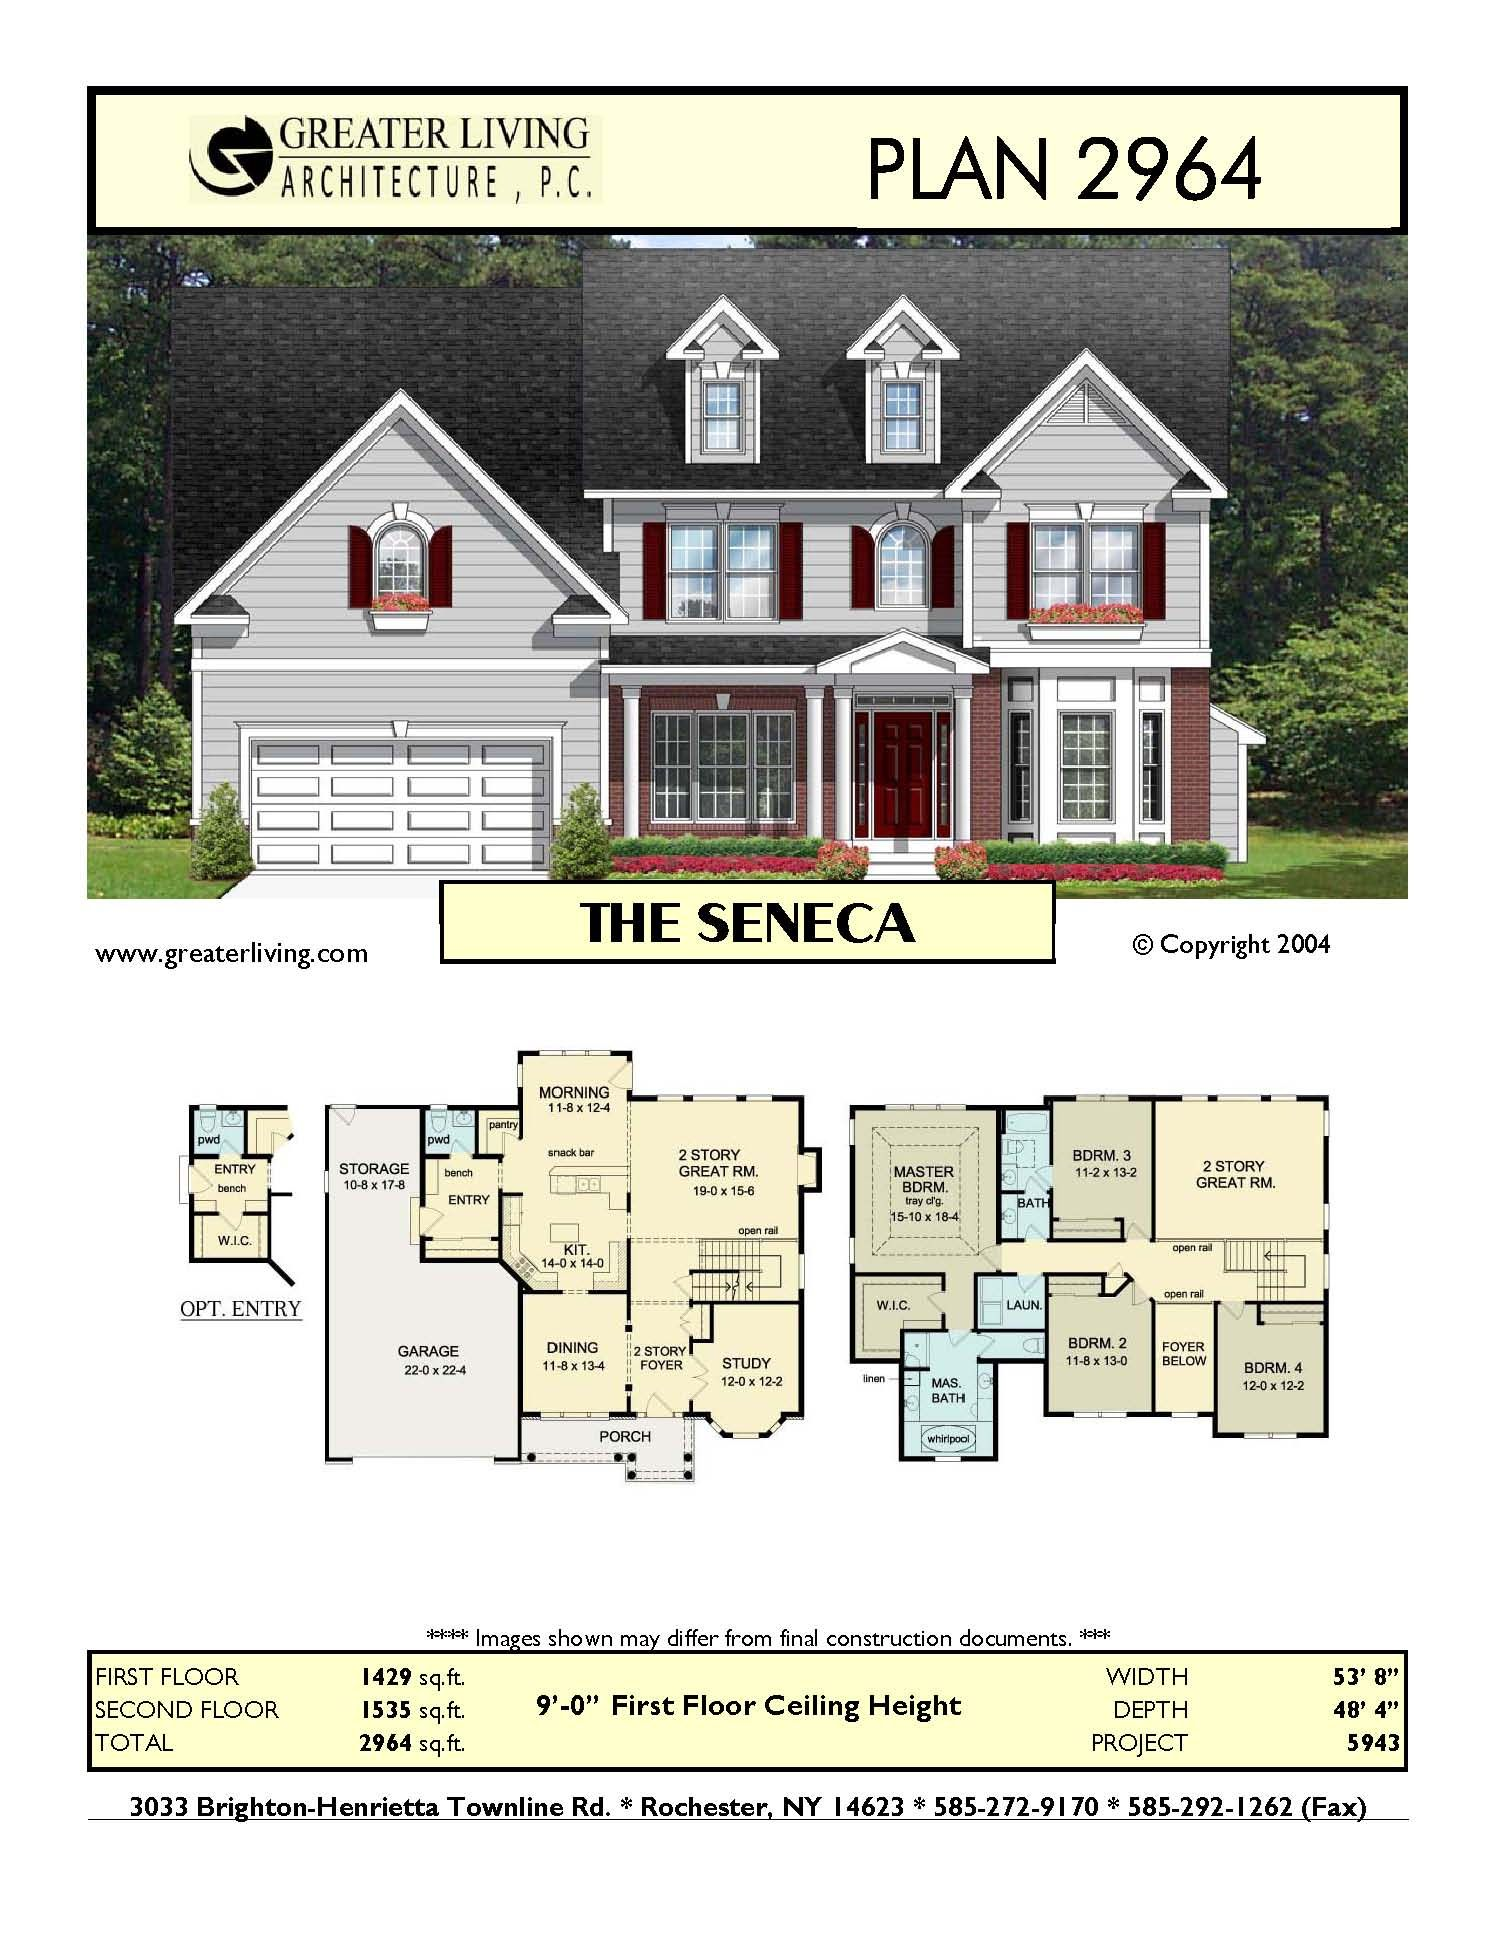 Plan 2964 The Seneca House Layout Plans House Plans Building A House